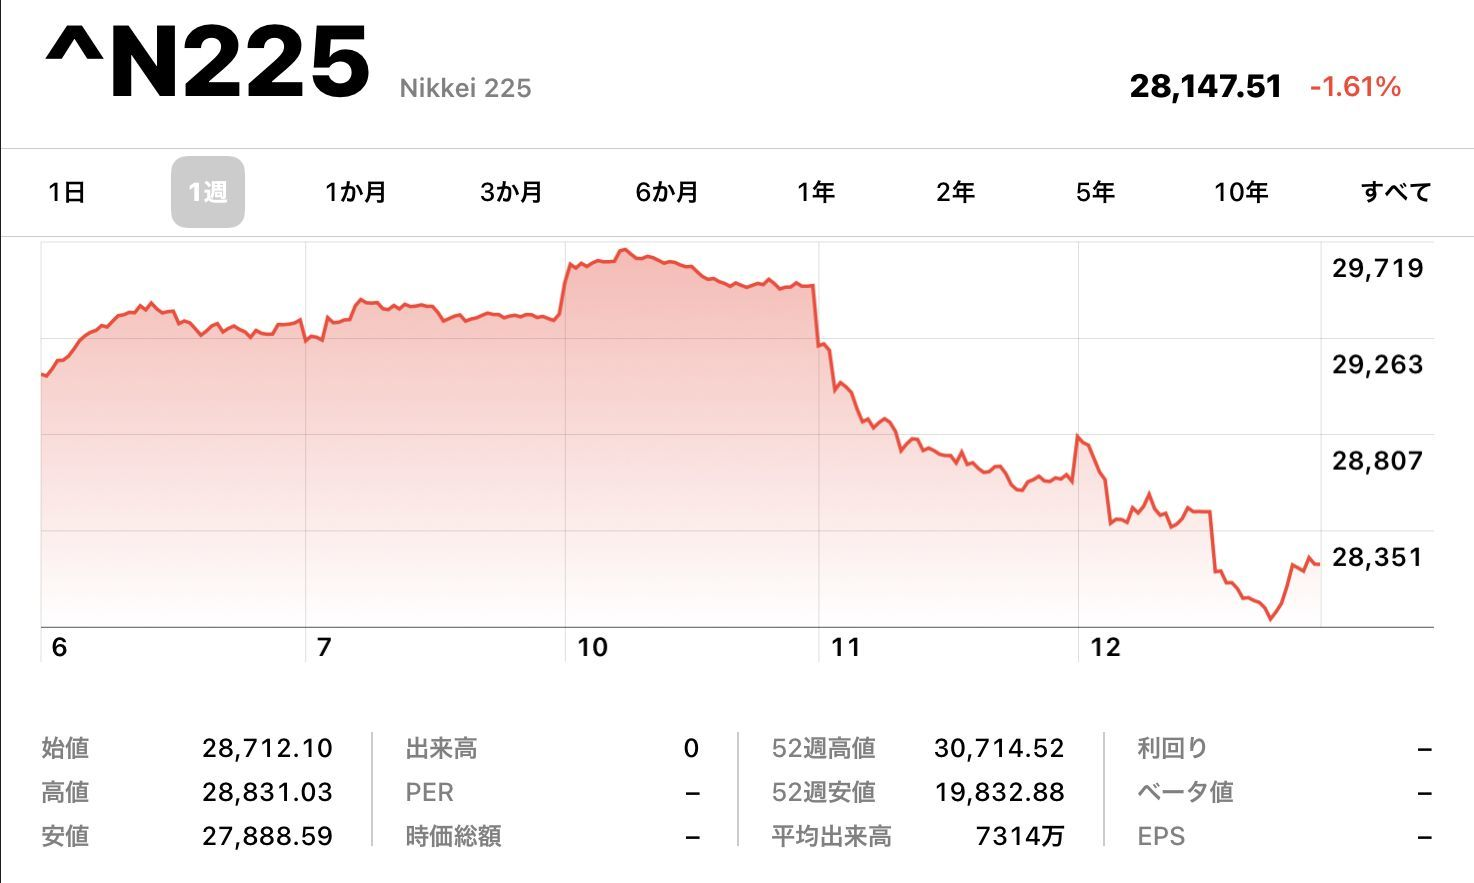 株価は続落、札幌・北海道の新規感染者は歴史的増加_c0025115_22294234.jpg